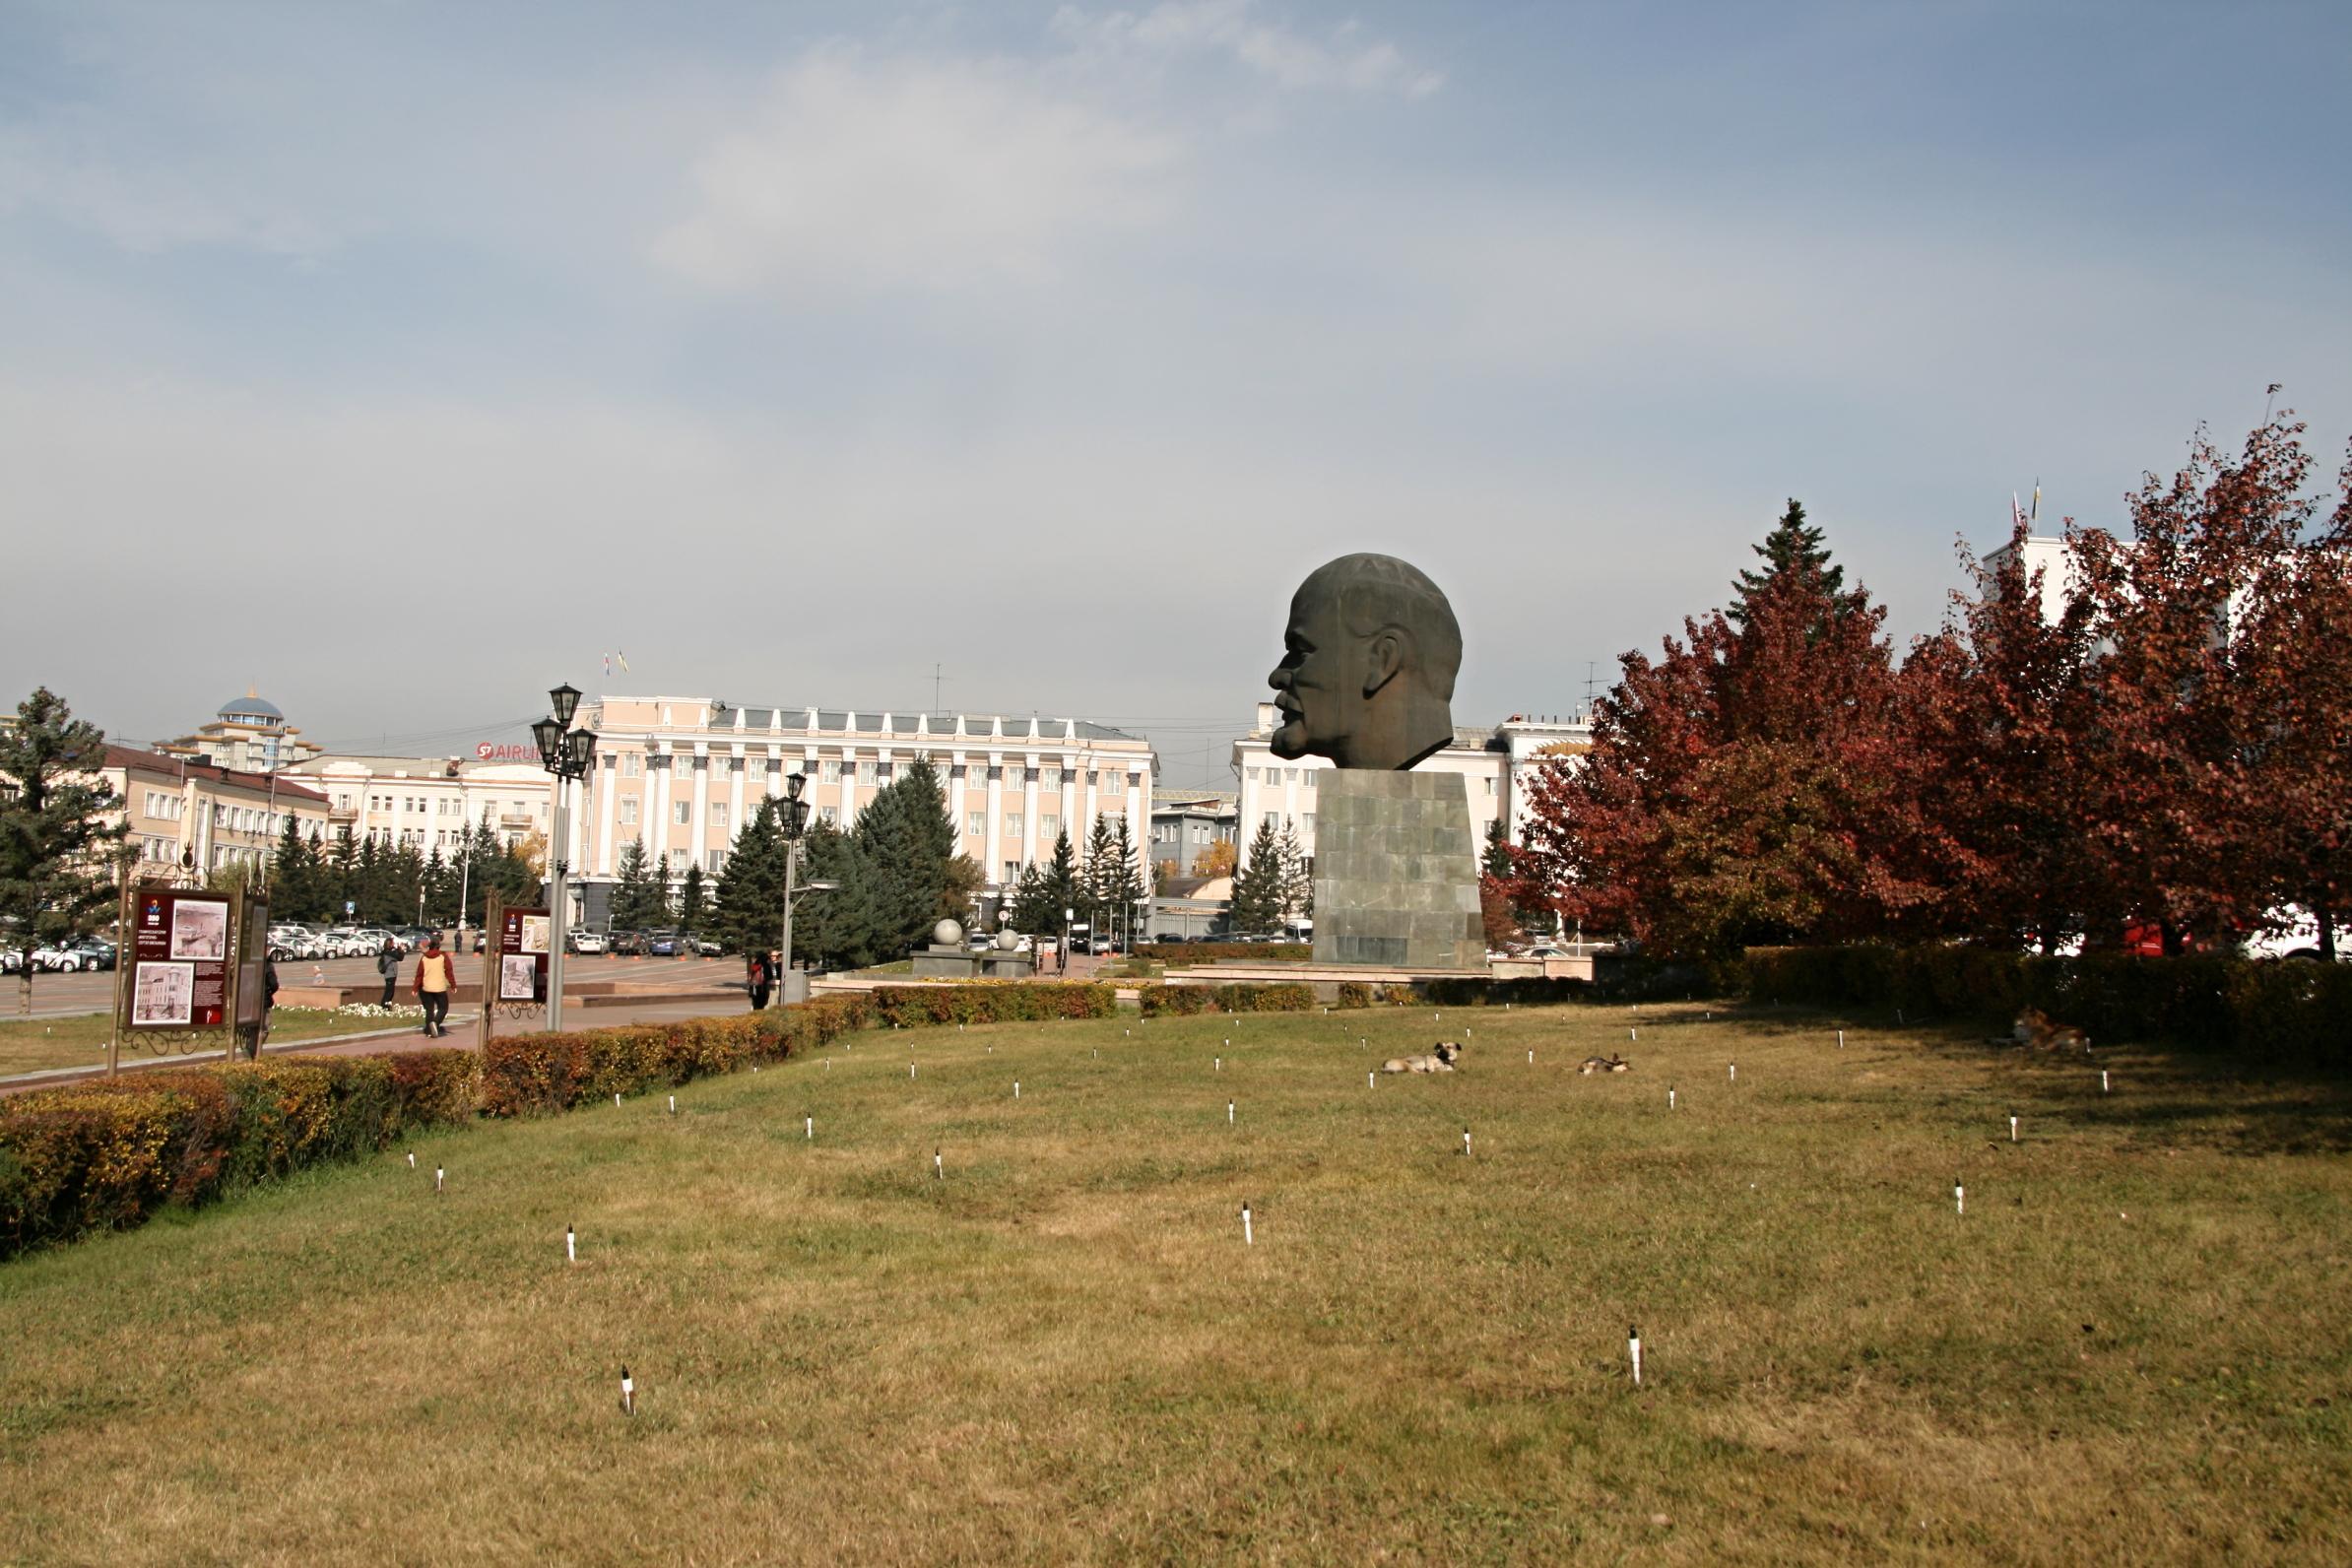 bajkal_16